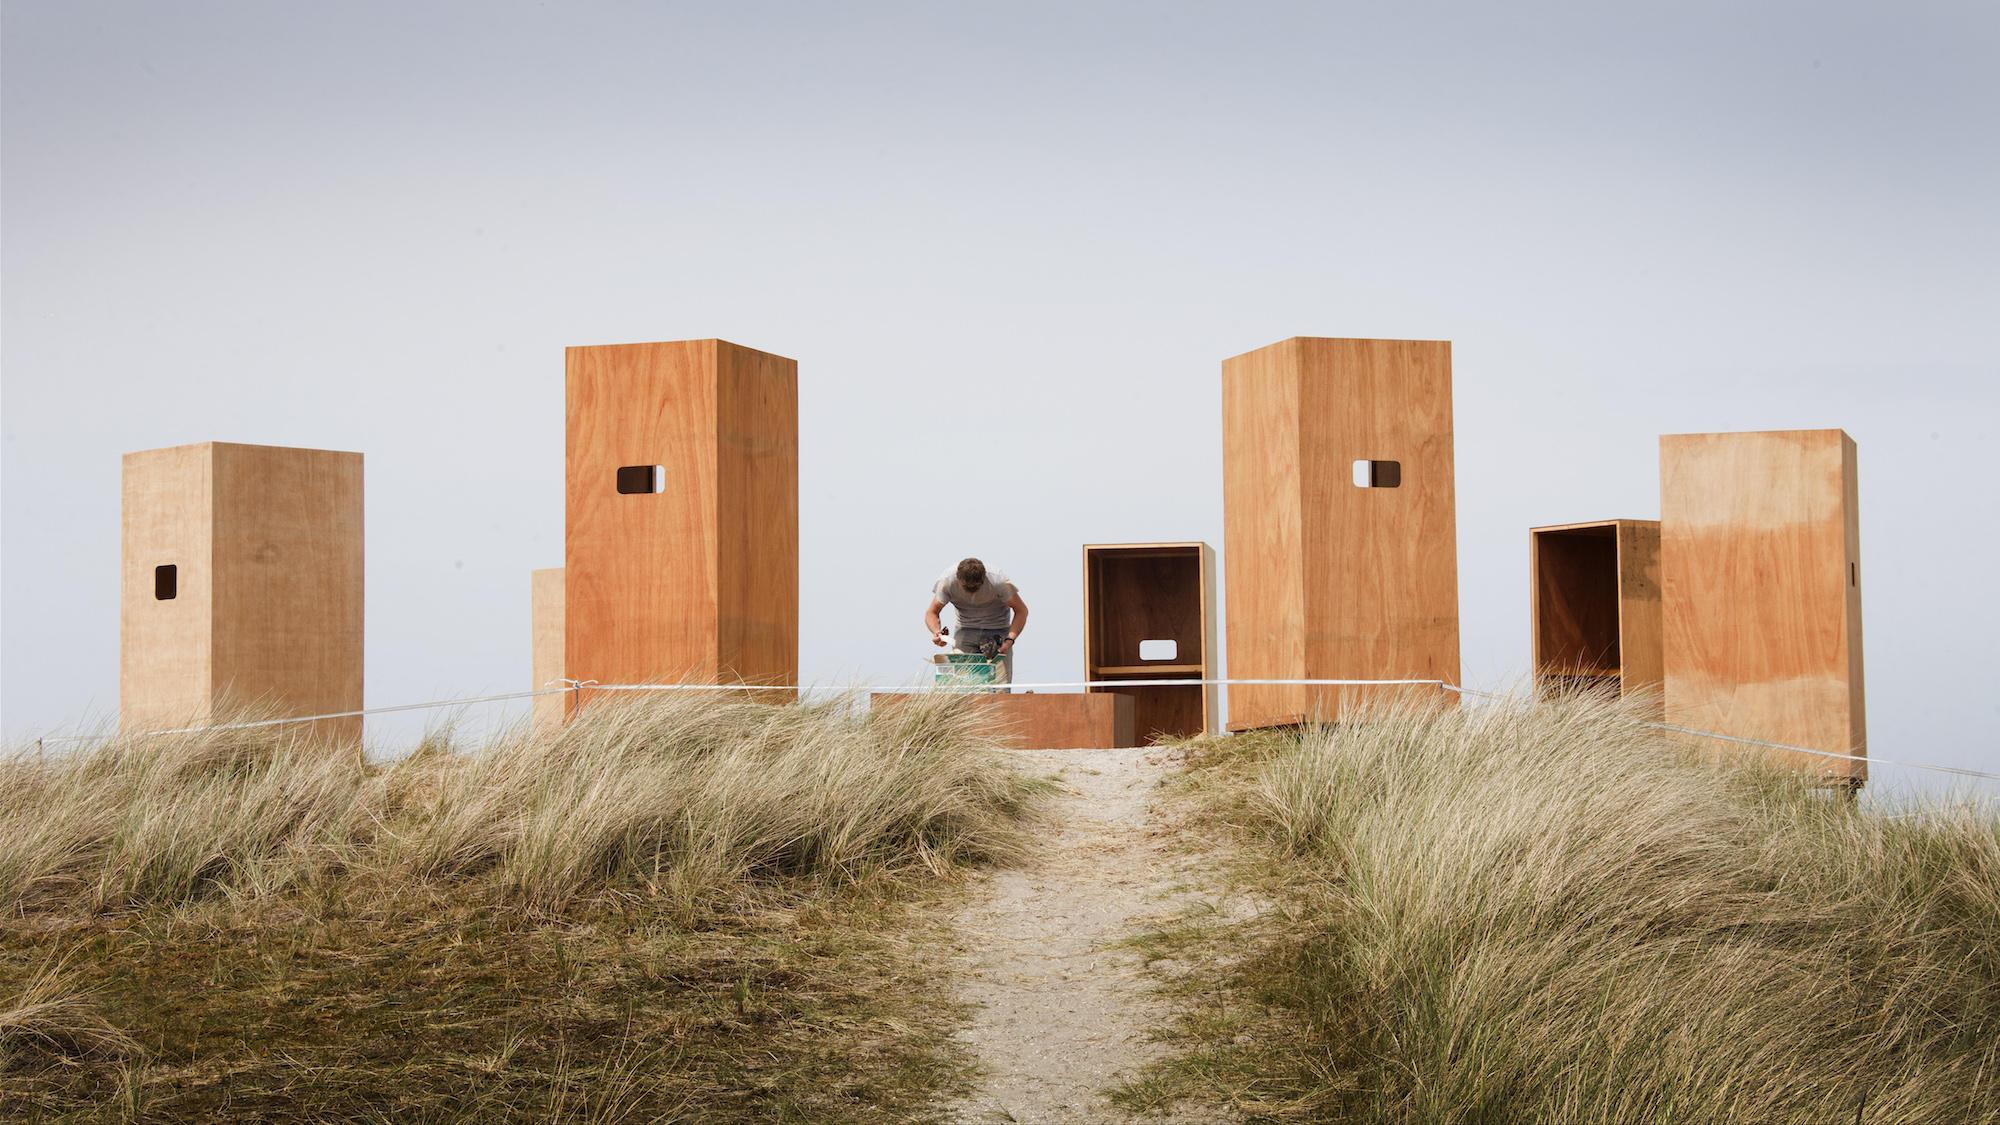 Oerol ( The Netherlands, 2013) © Saris & den Engelsman